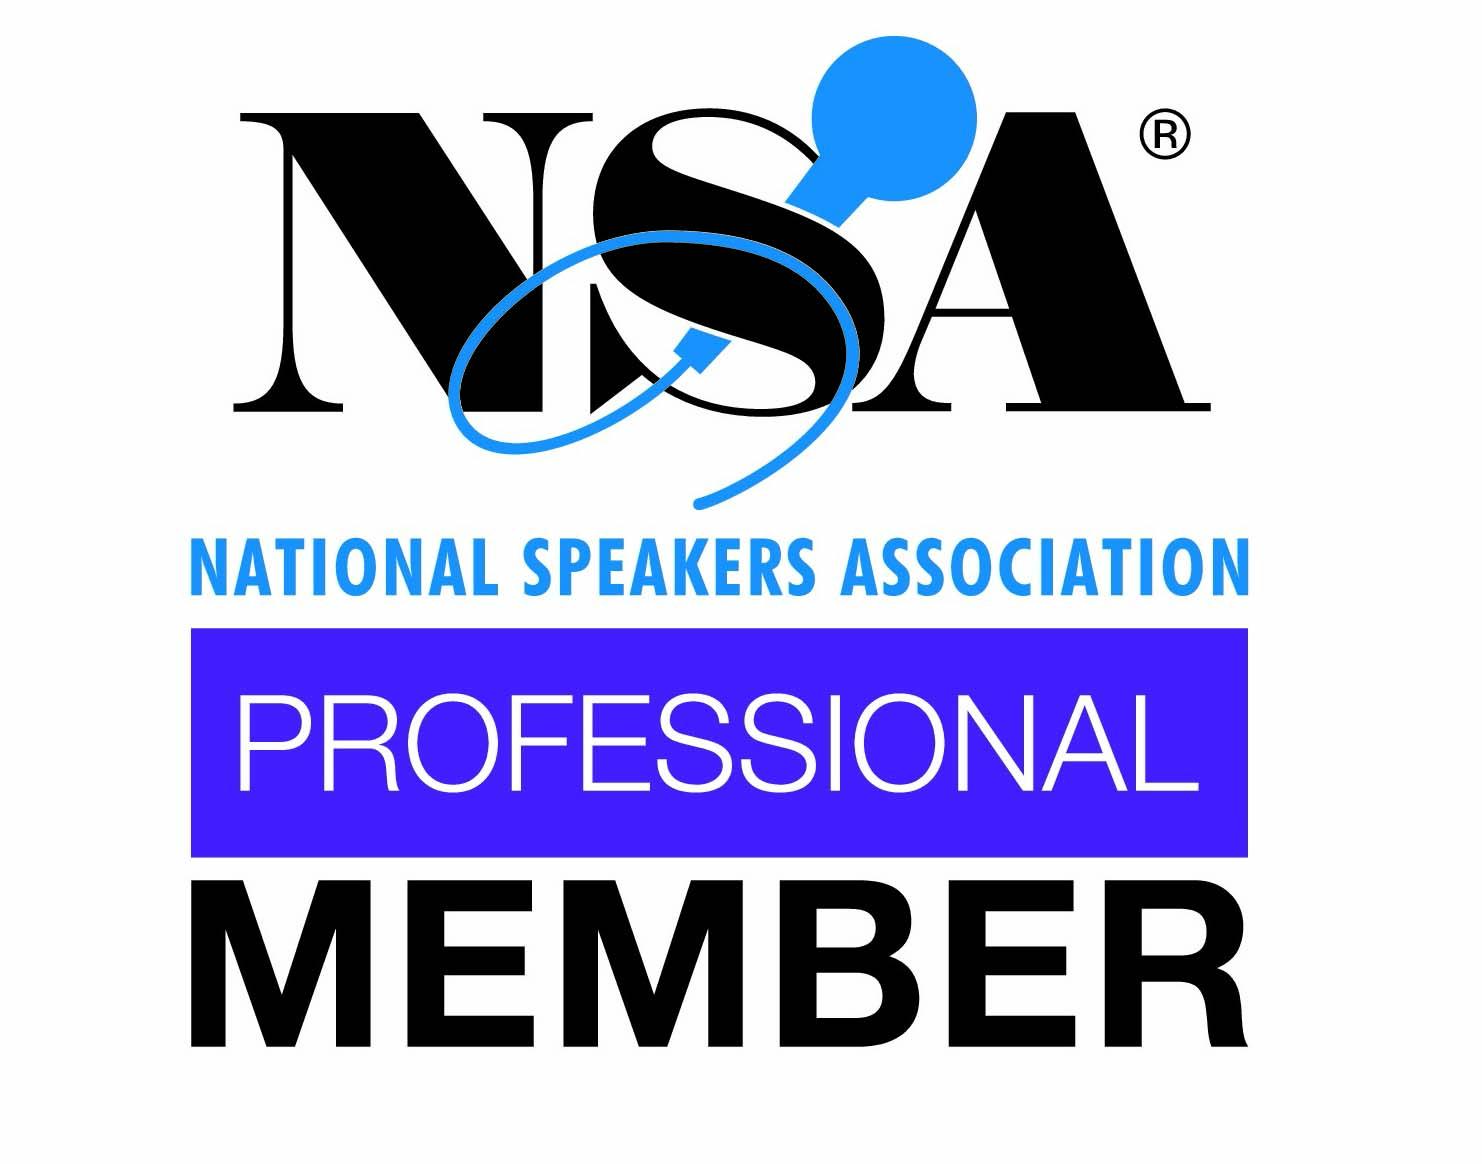 NSA_member_logos_christakakura_rev2